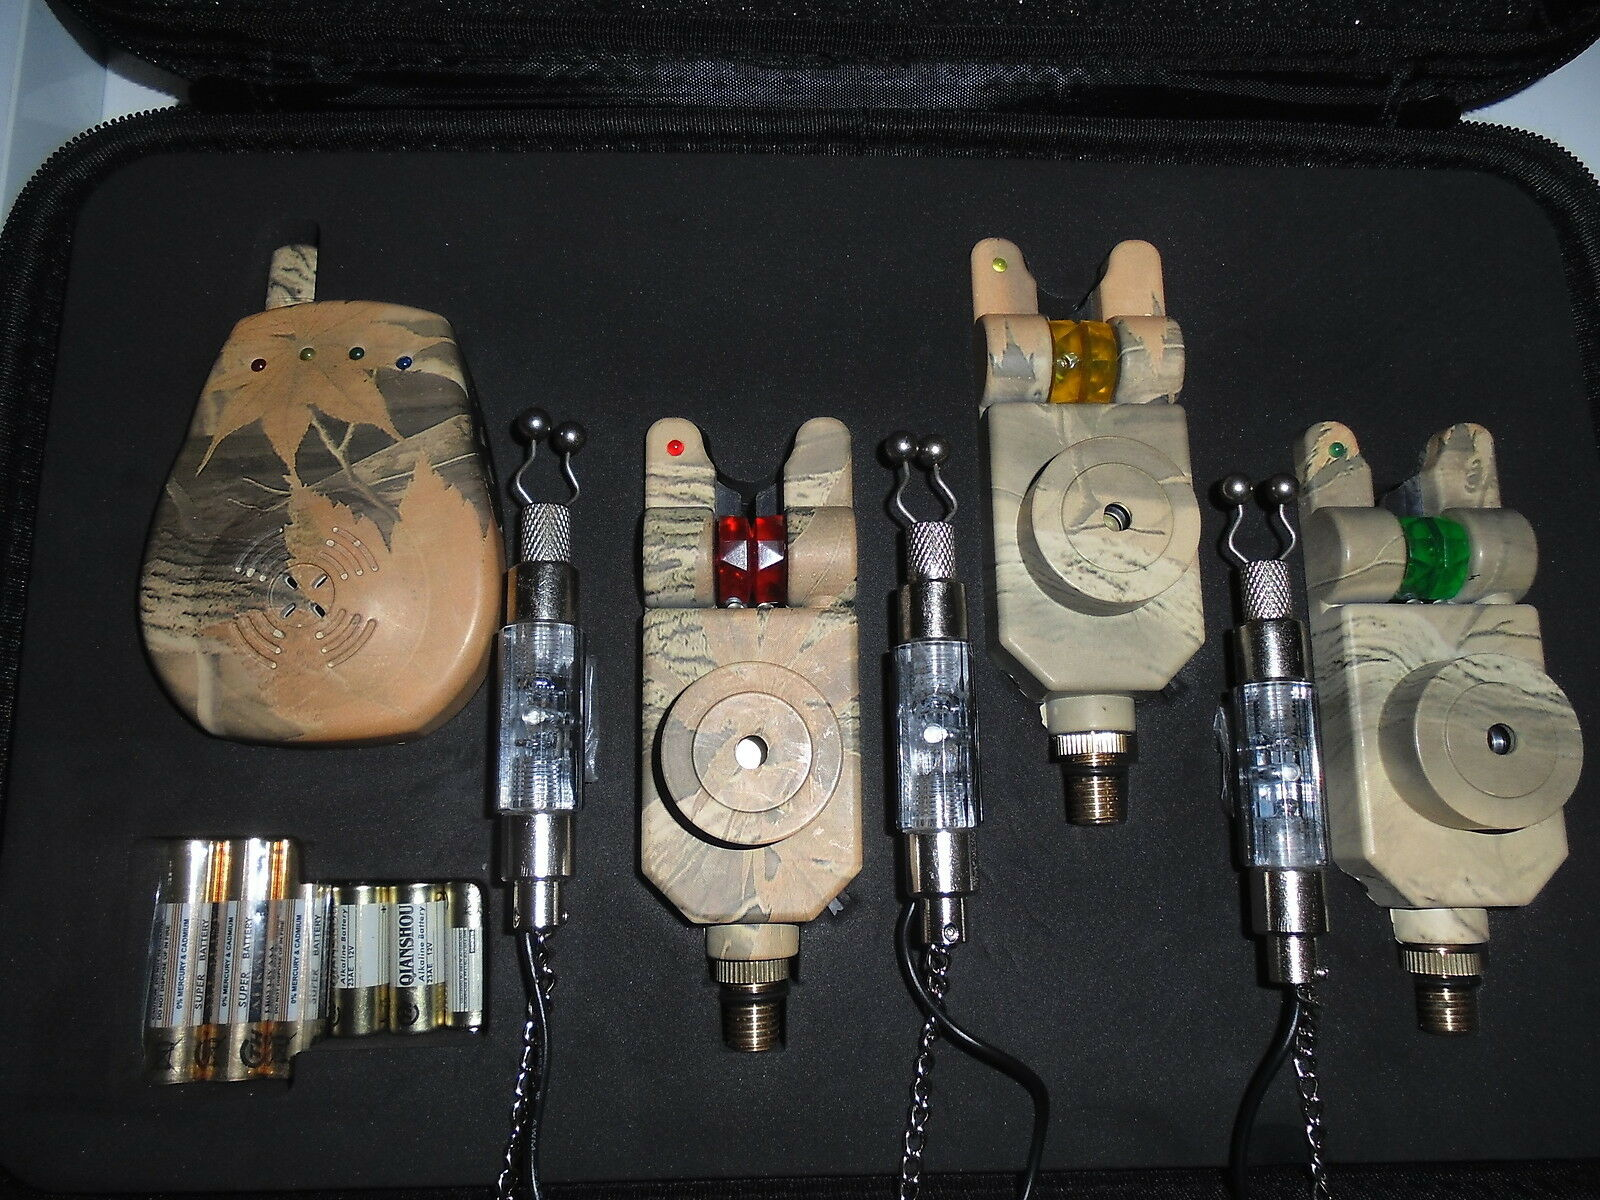 3 X Rodillo MAG Inalámbrico Camo Alarmas Bite + receptor + illumindicators, Regalo Gratis